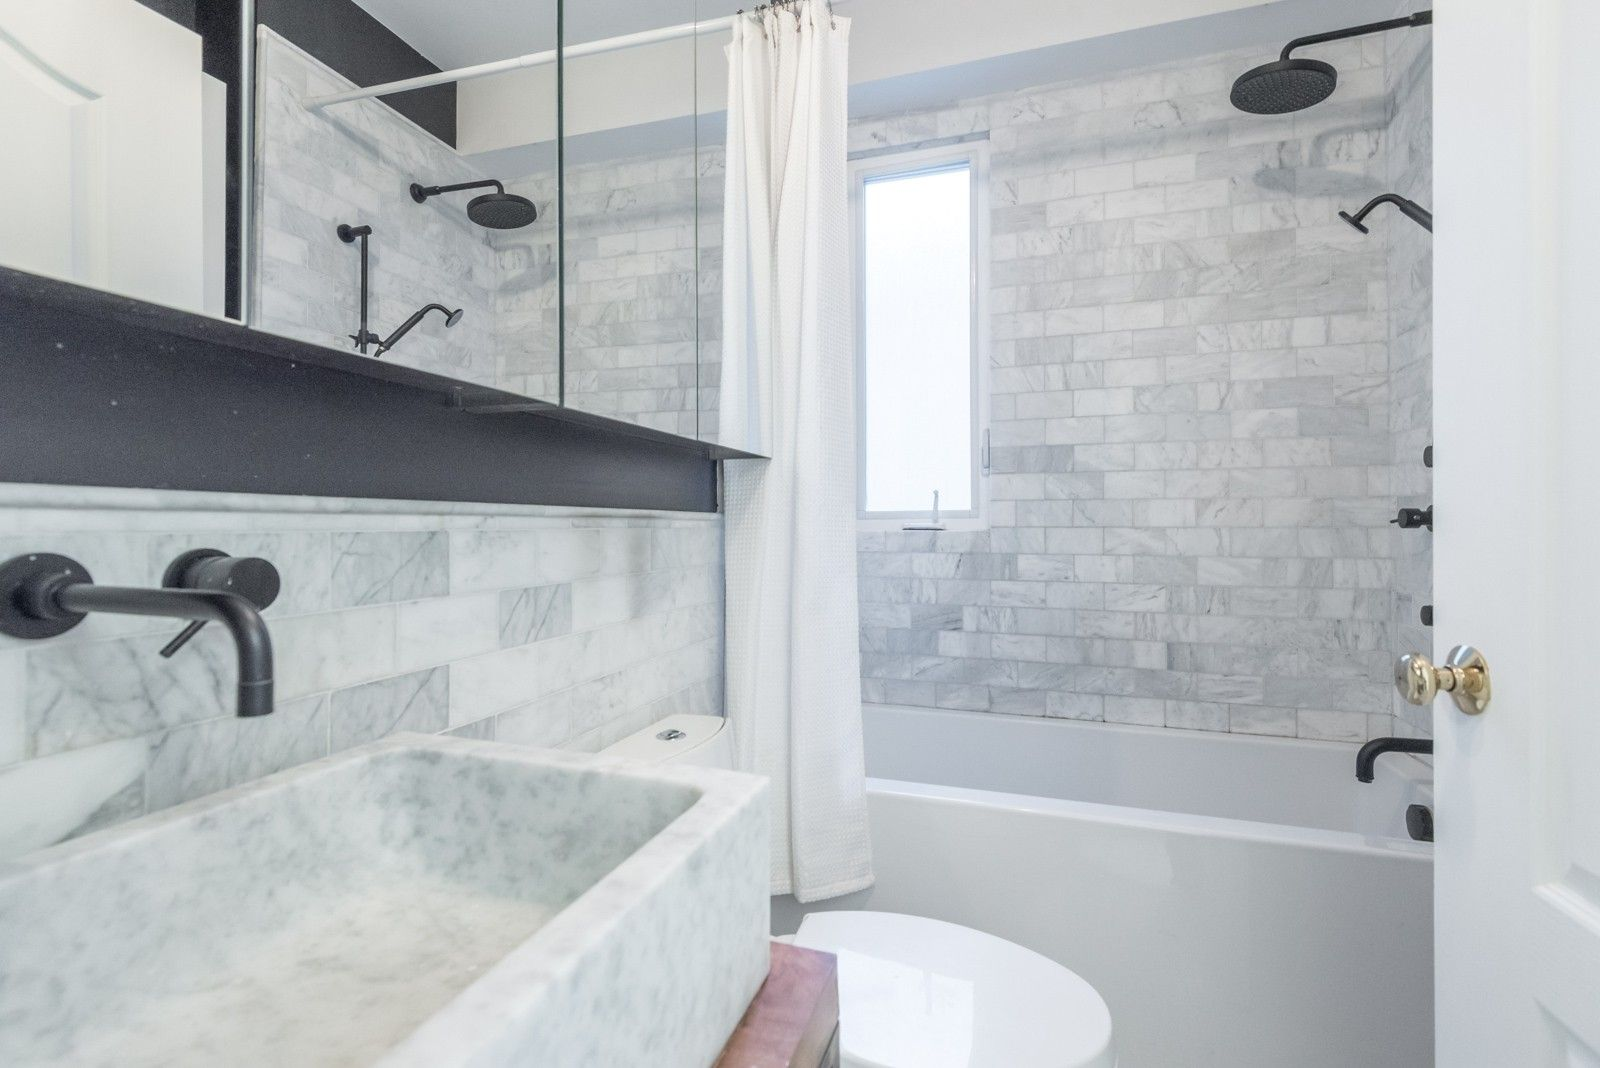 Badkamer Met Marmer : Marmer in de badkamer badkamer badkamer